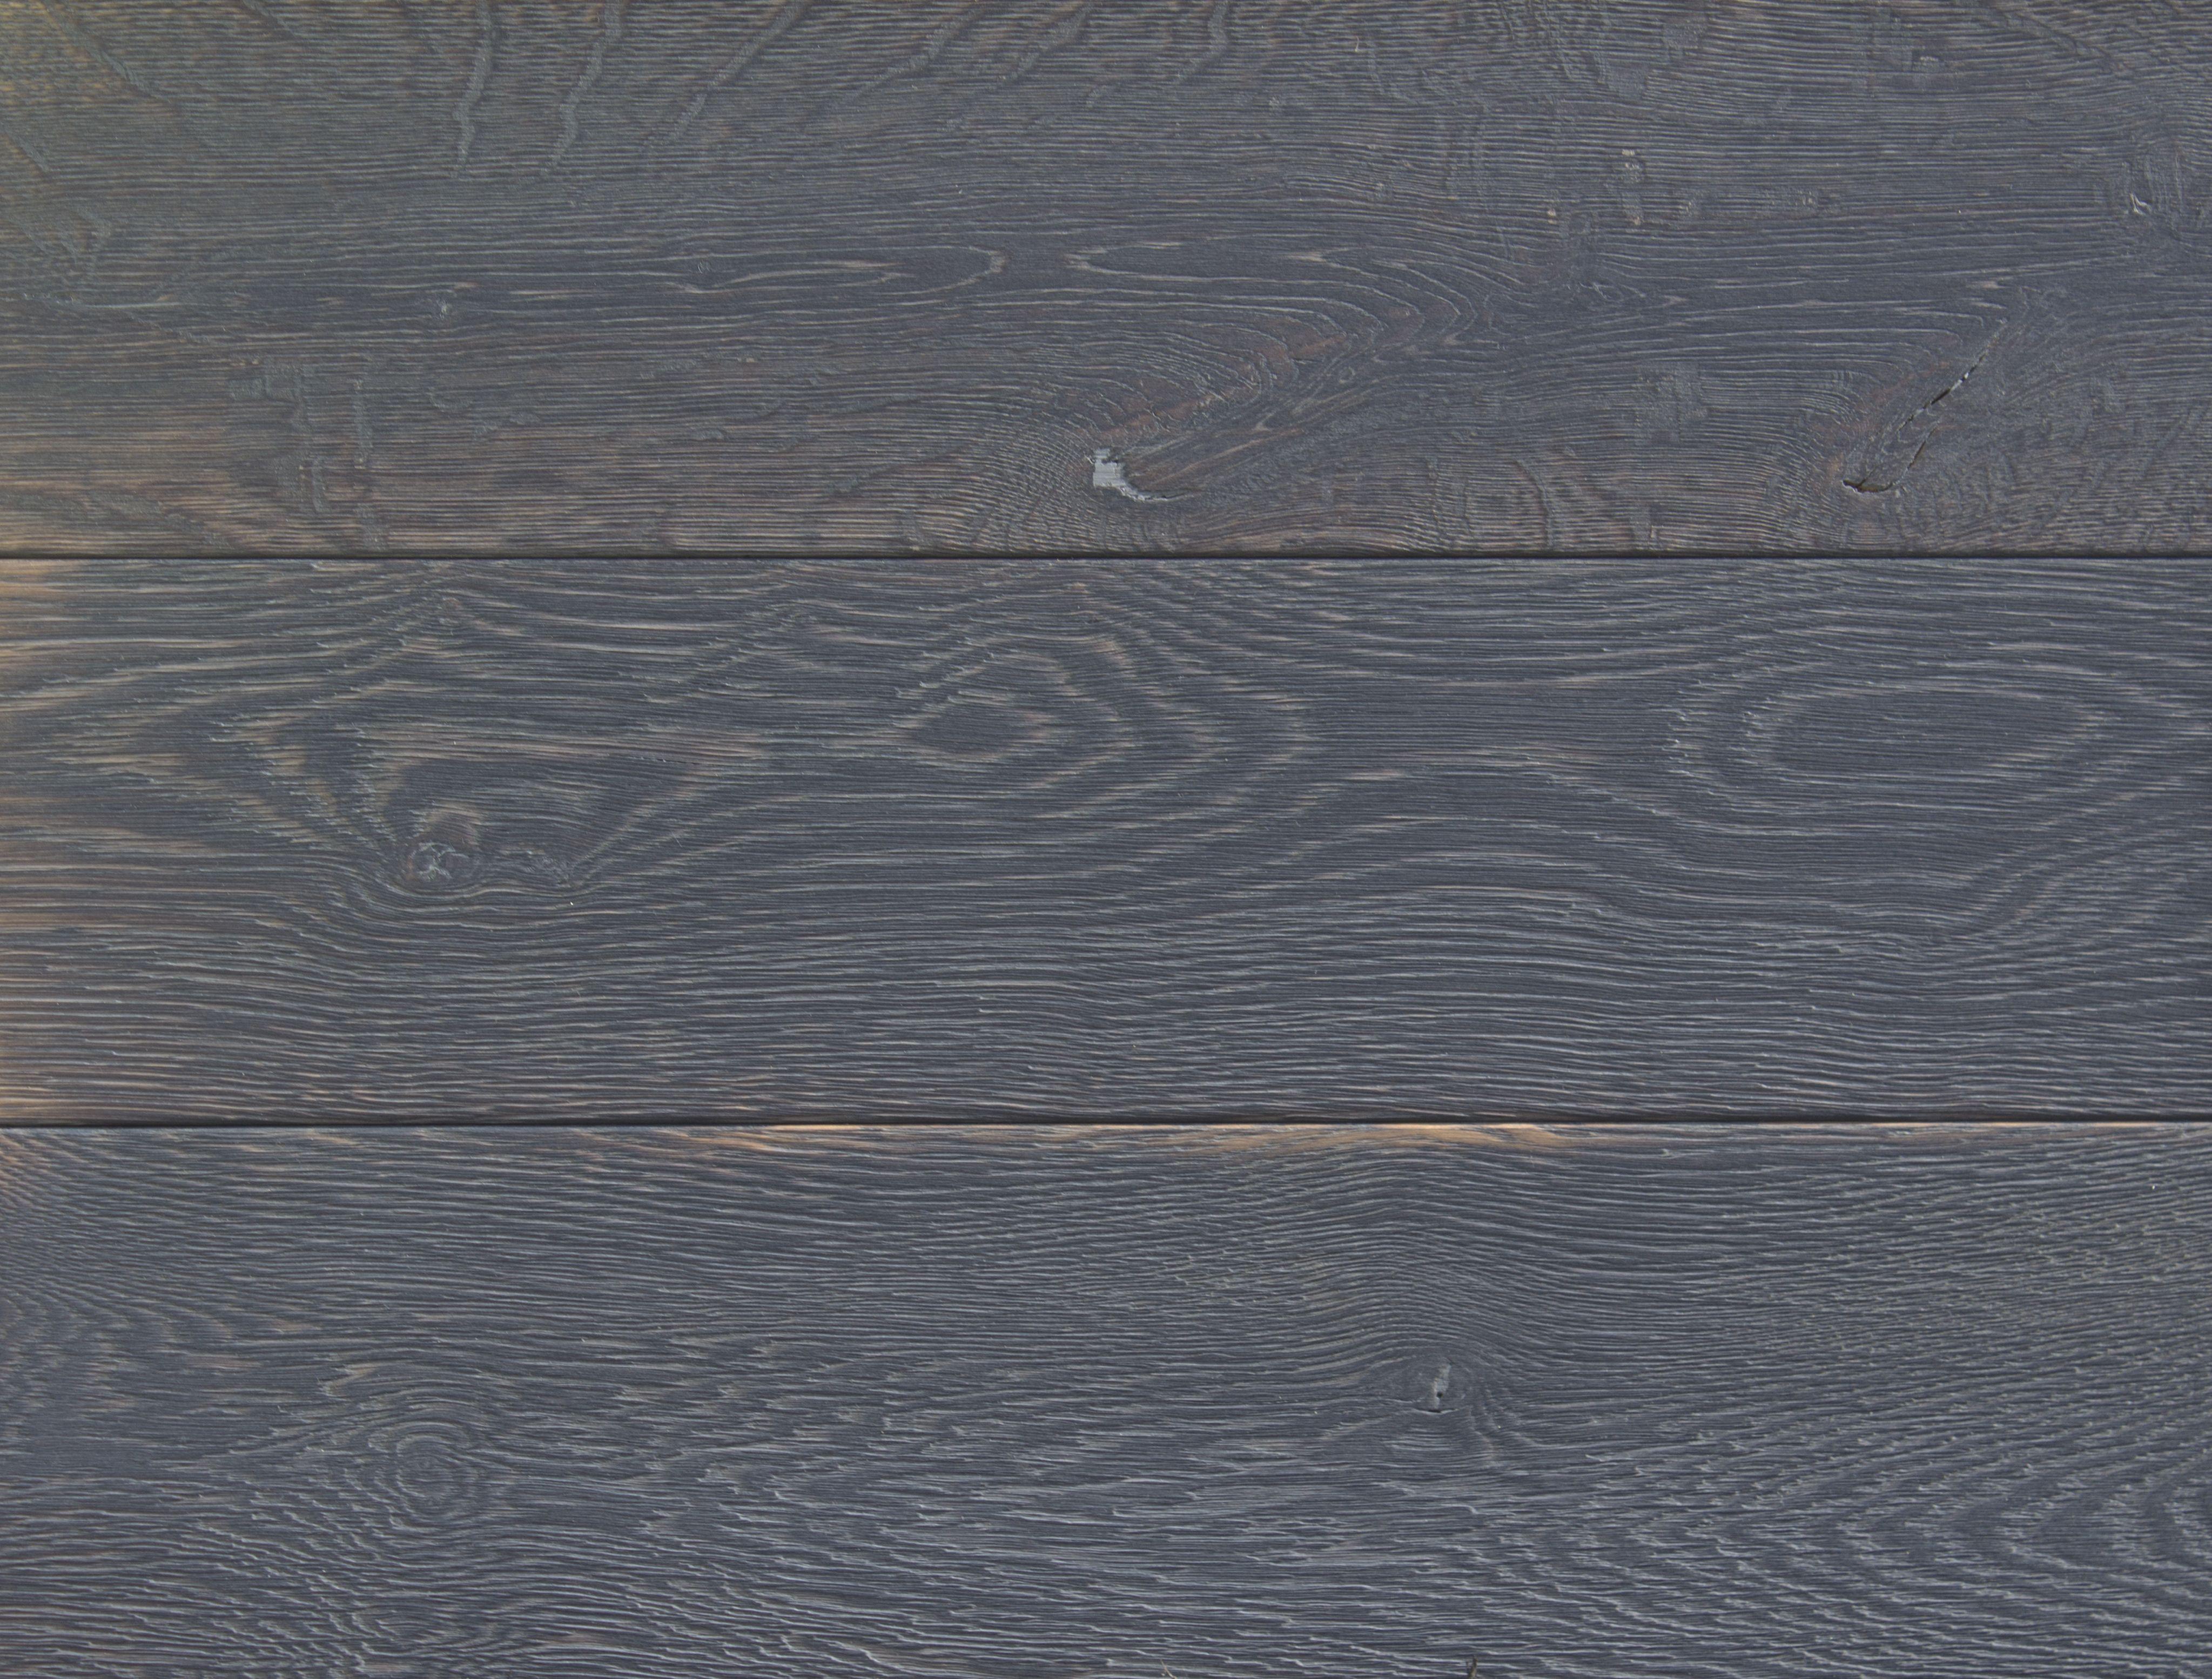 white oak grey hardwood flooring of charred flooring from resawn timber co zen shou sugi ban charred in charred flooring from resawn timber co zen shou sugi ban charred wide plank white oak with zero voc hardwax oil finish